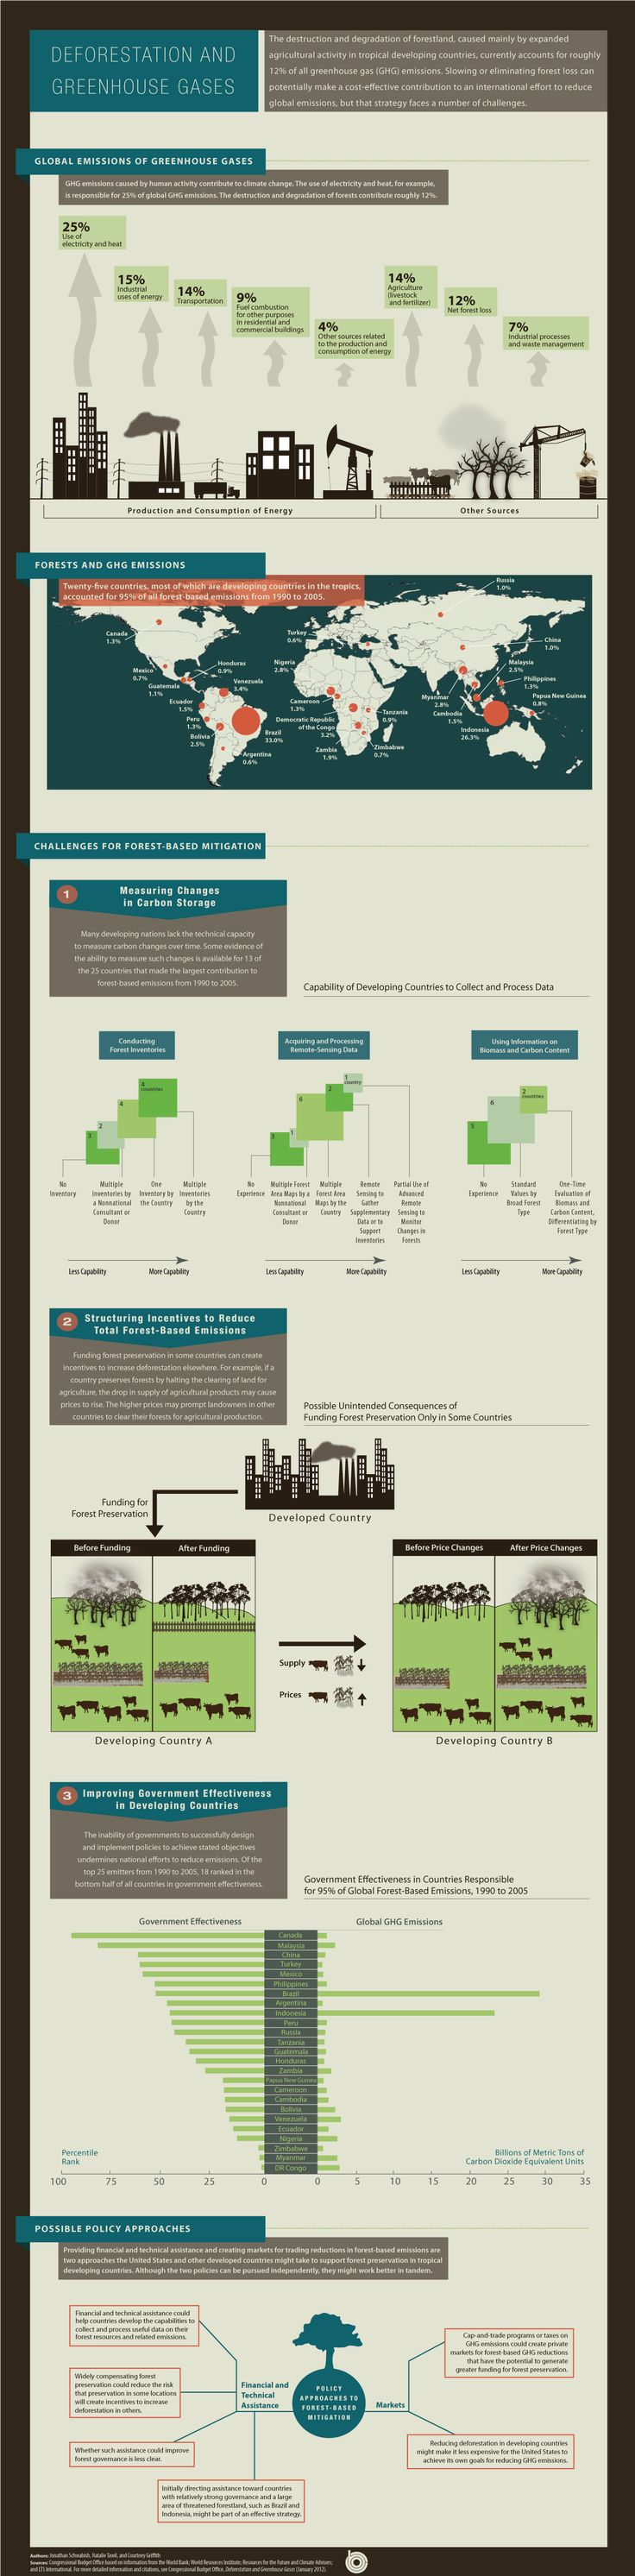 Deforestation and Greenhouse Gases. www.dogwoodalliance.org